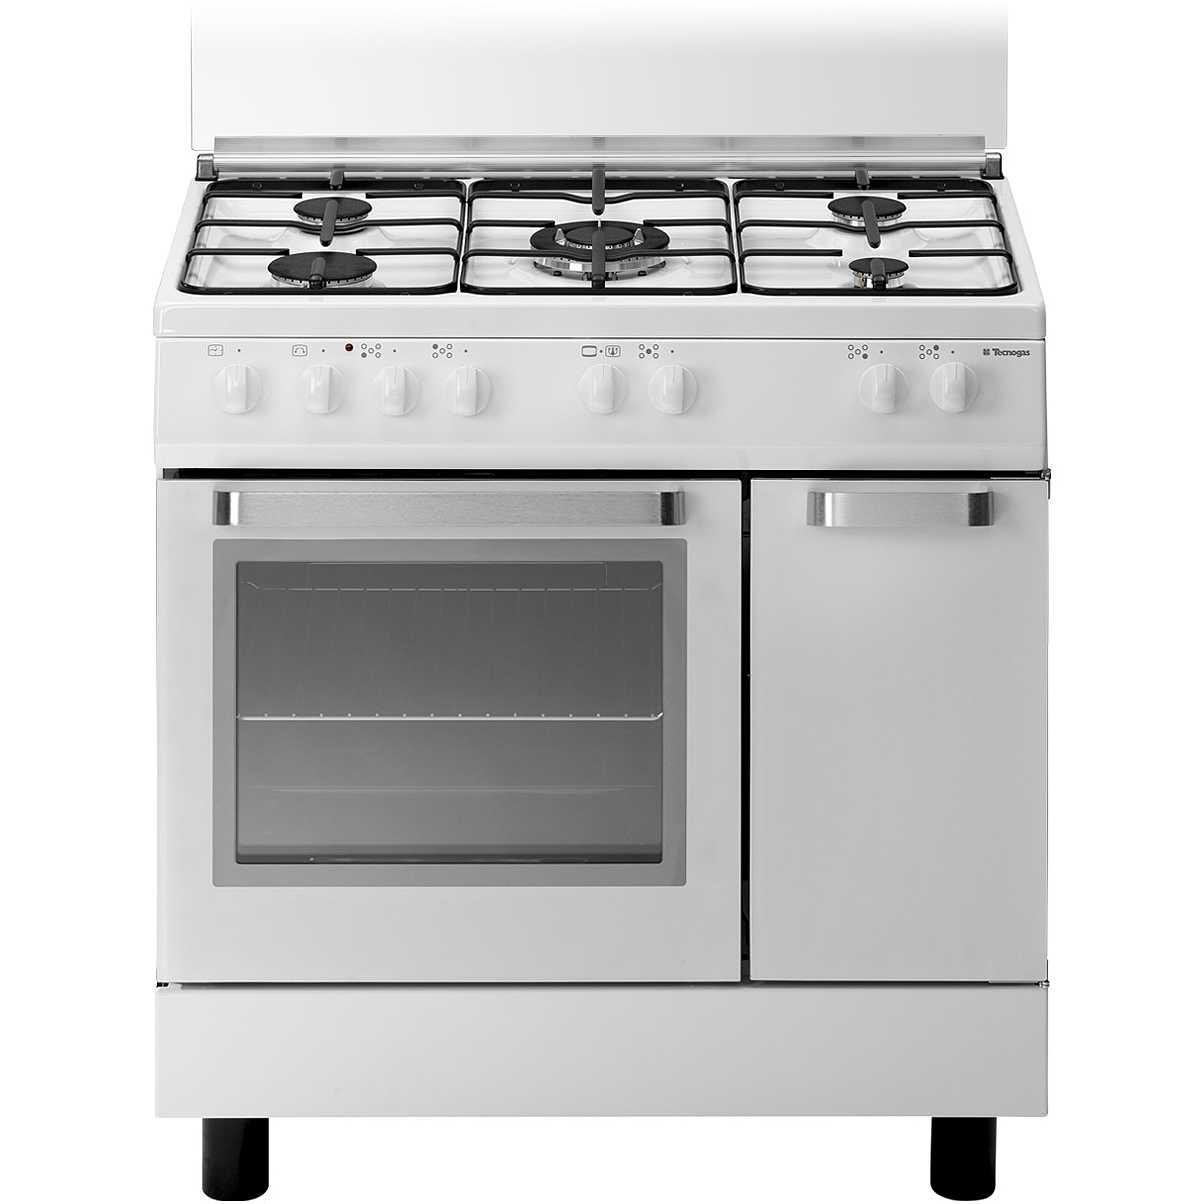 Tecnogas d827ws cucina 80x50 5 fuochi a gas forno for Cucina 5 fuochi 70x60